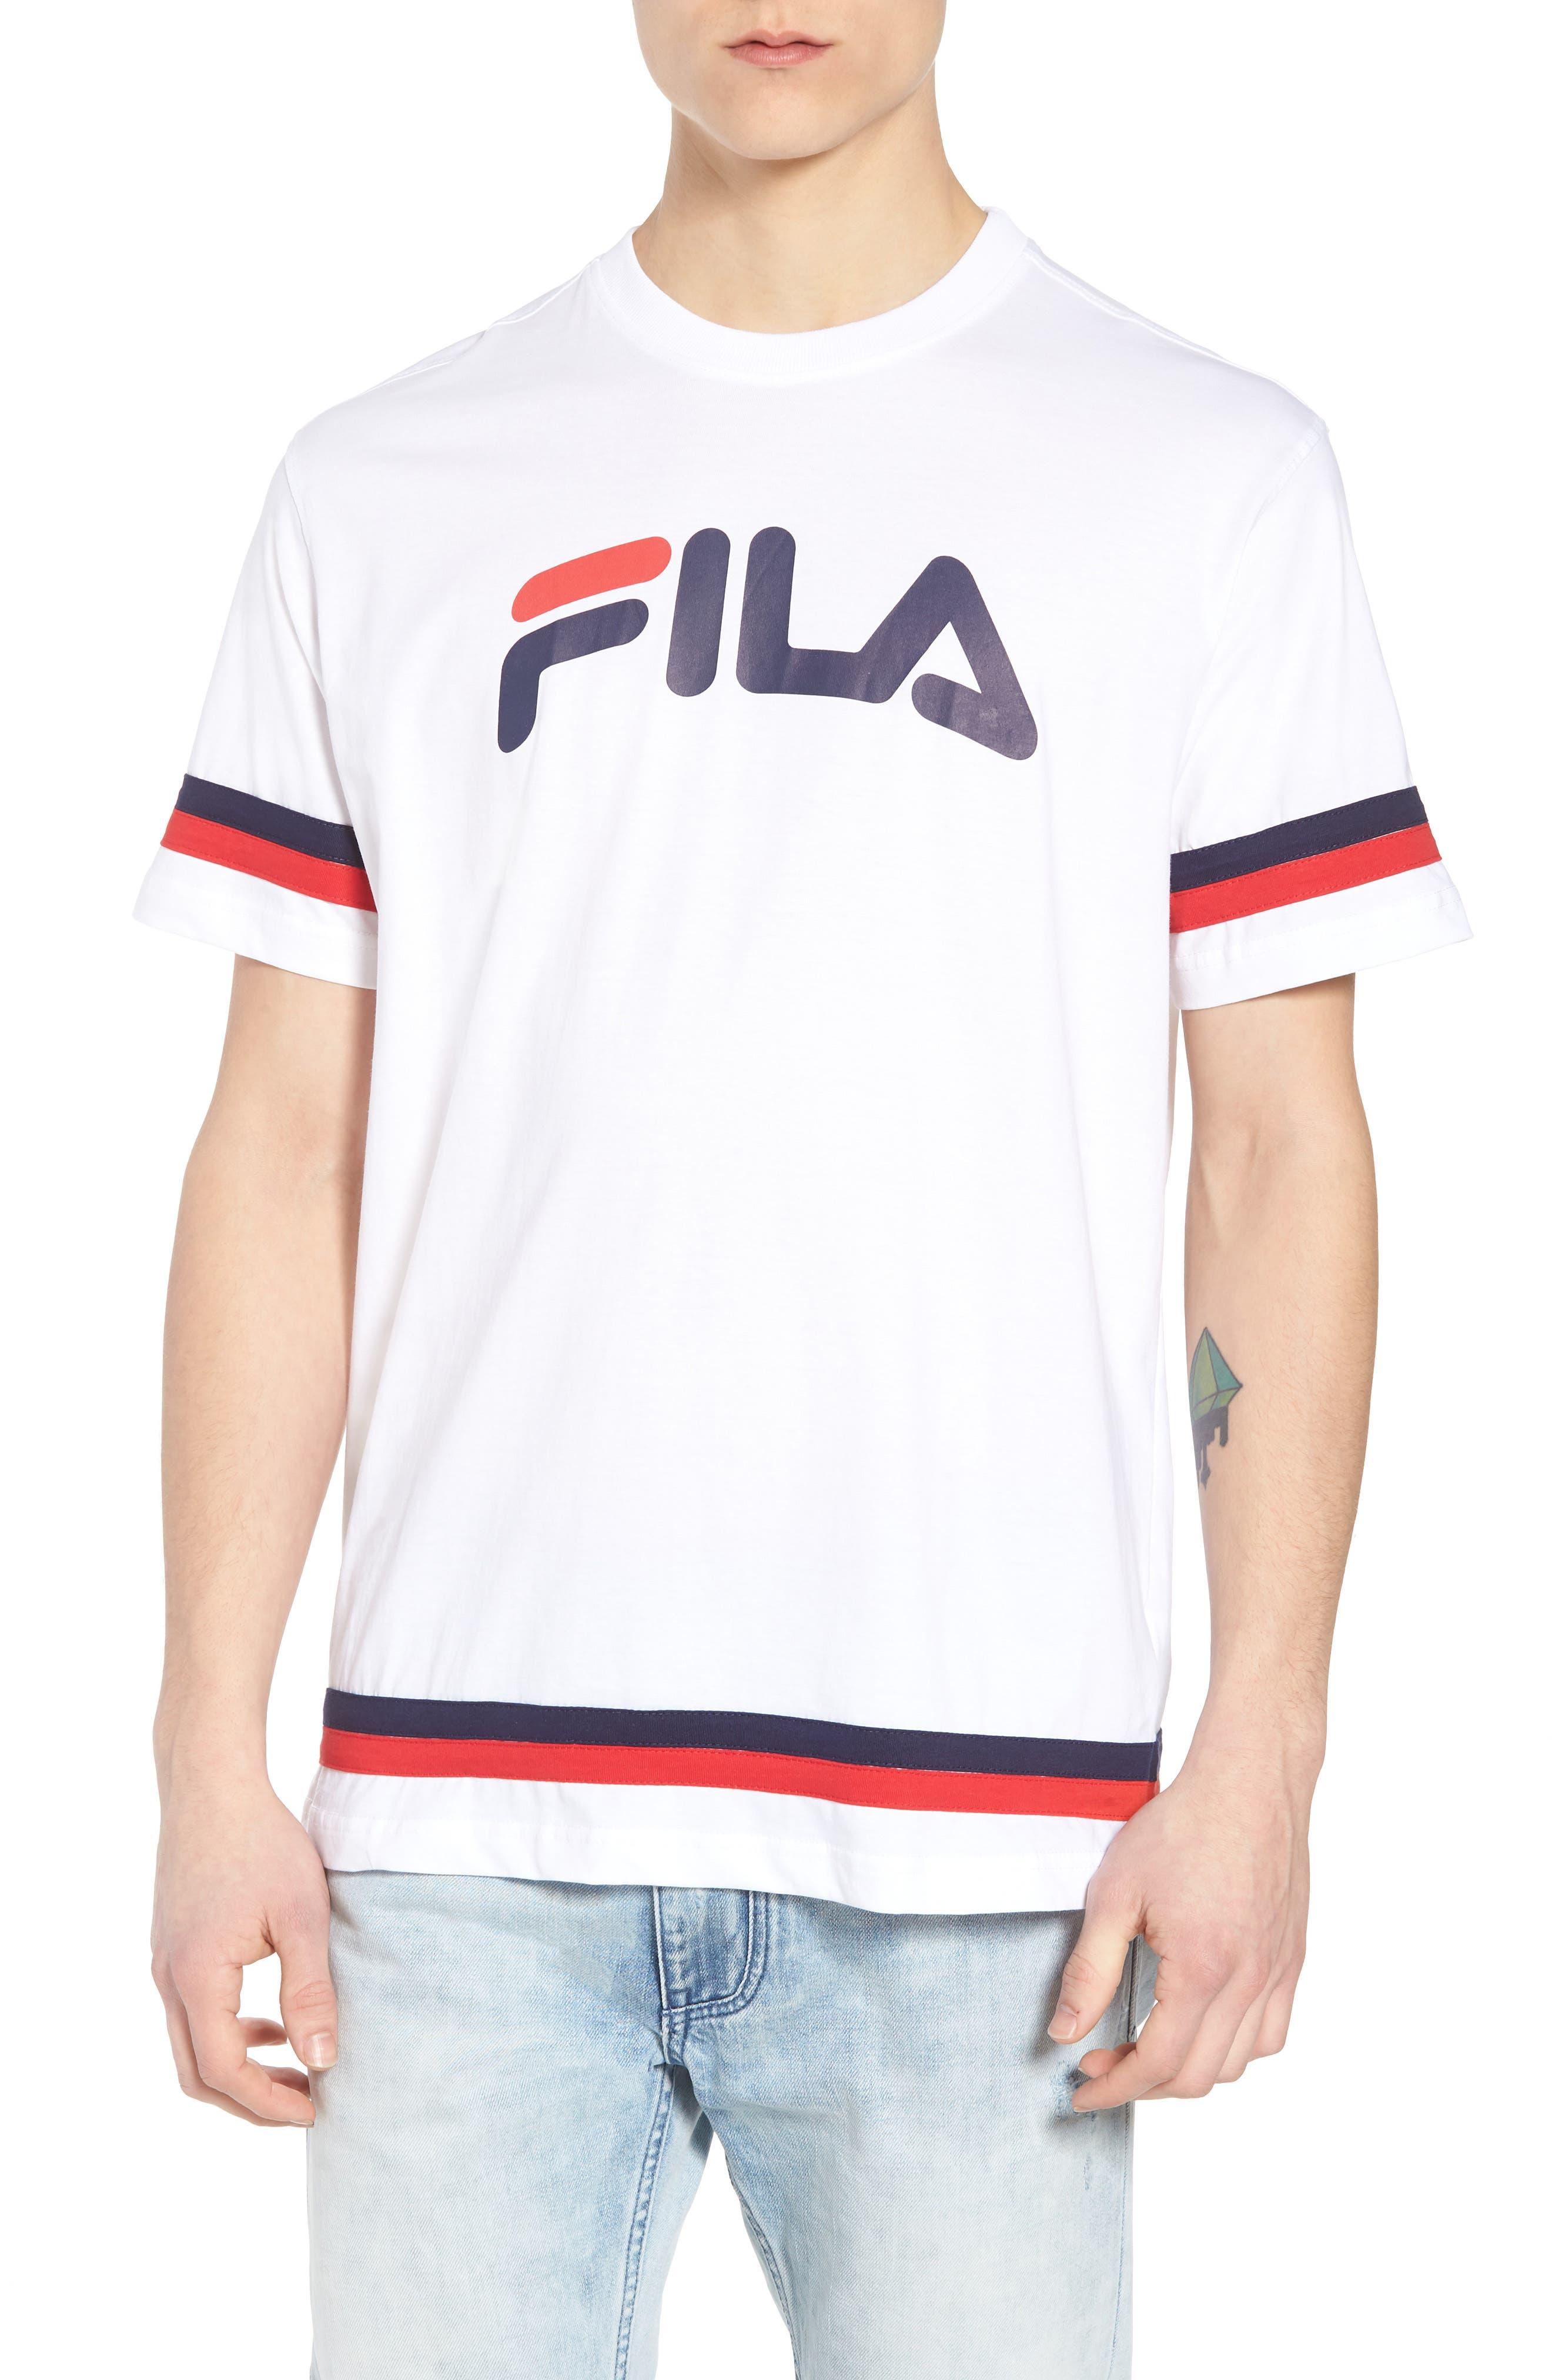 FILA Riley T-Shirt